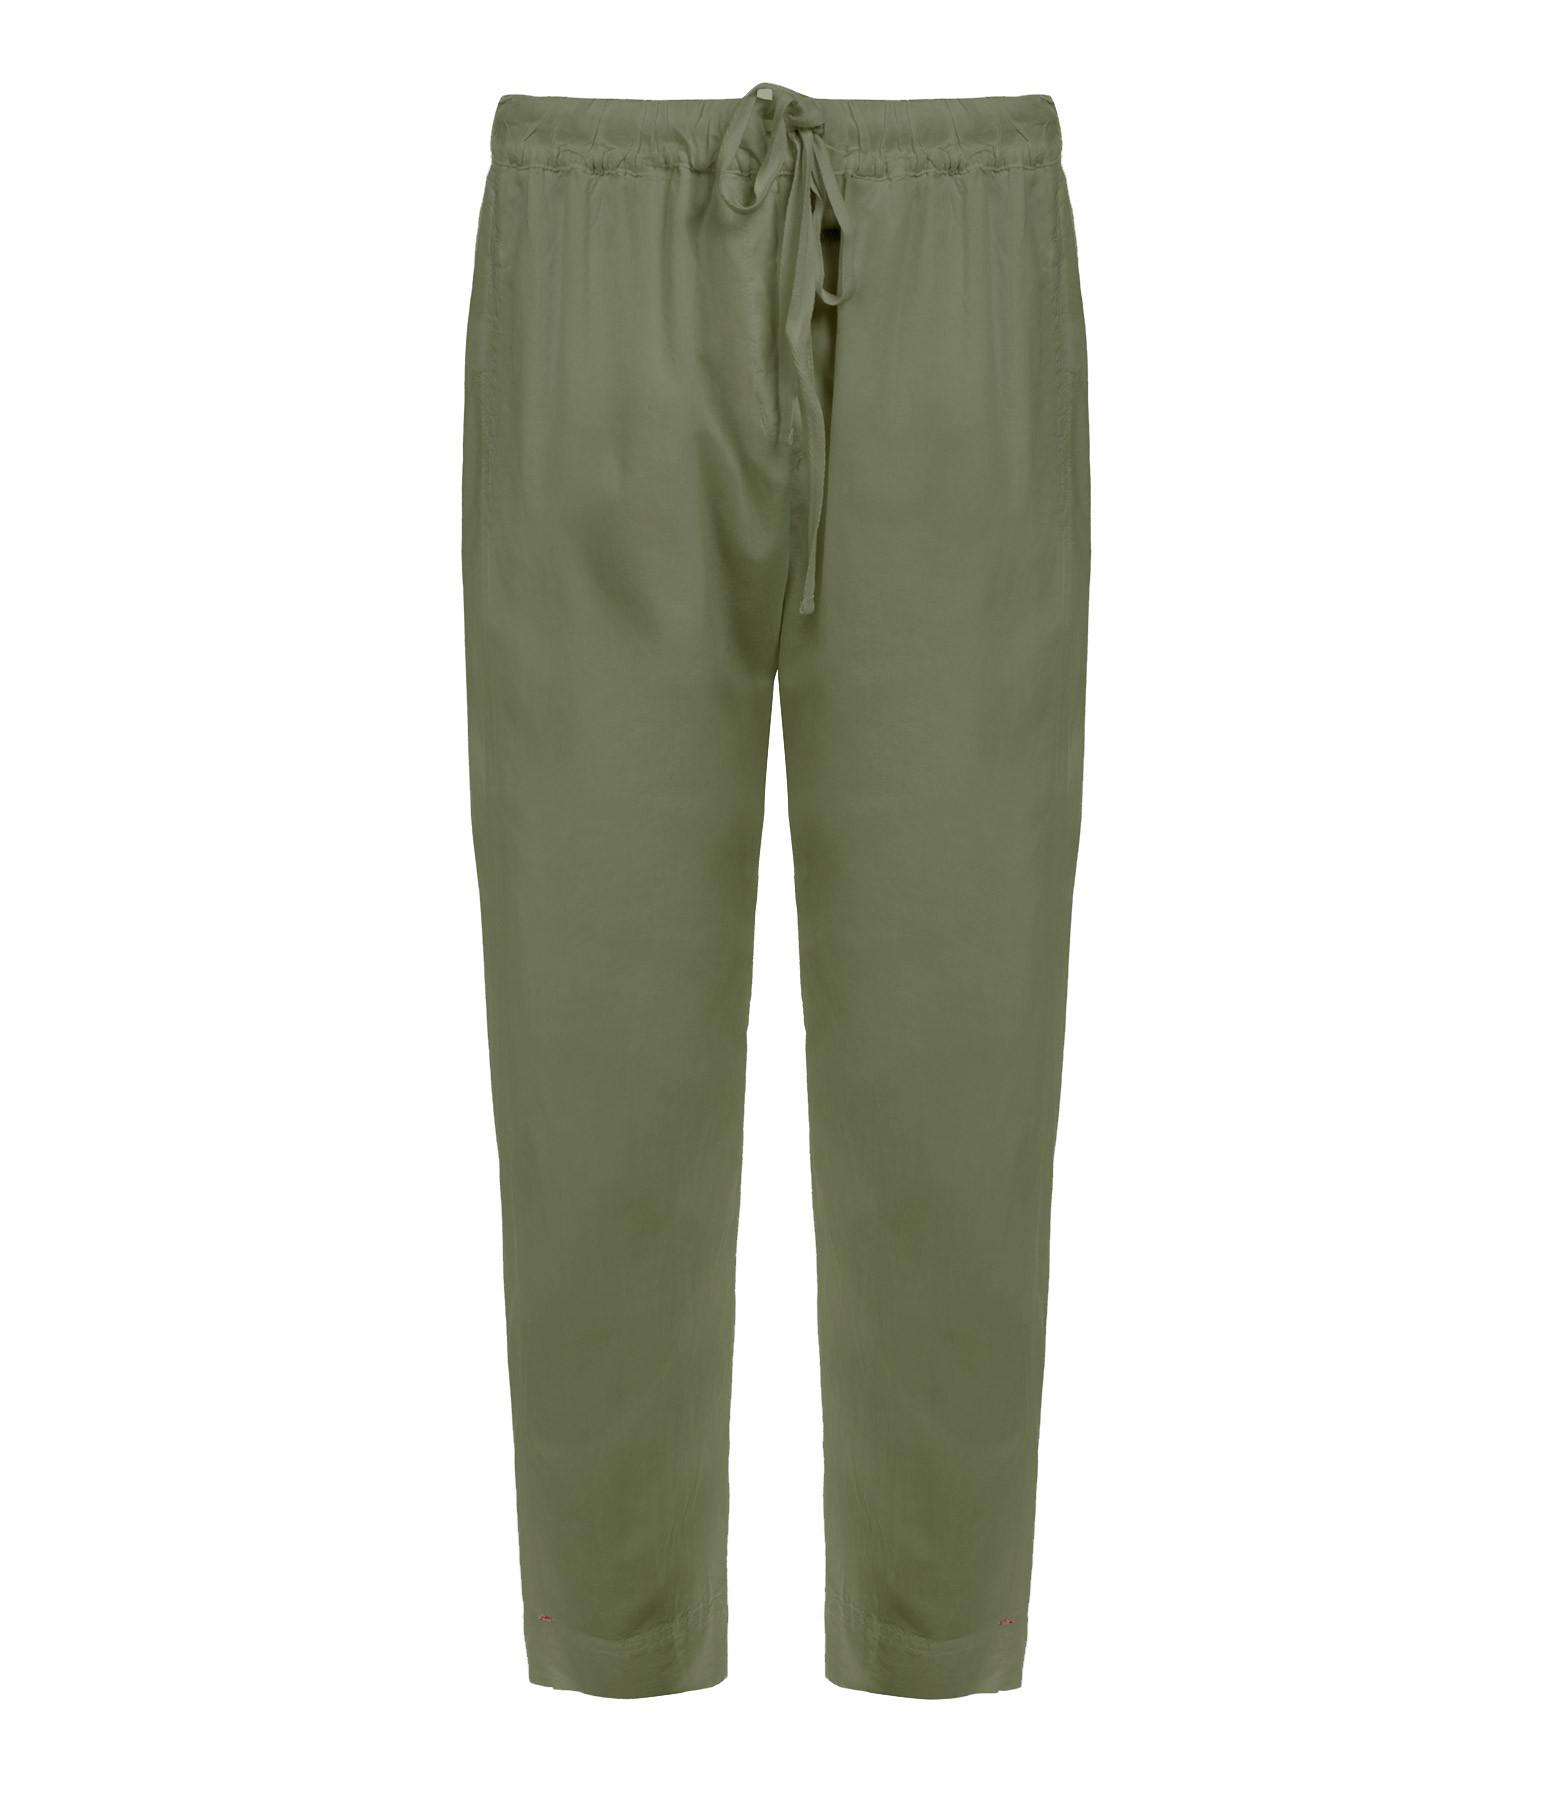 XIRENA - Pantalon Draper Vert Olive